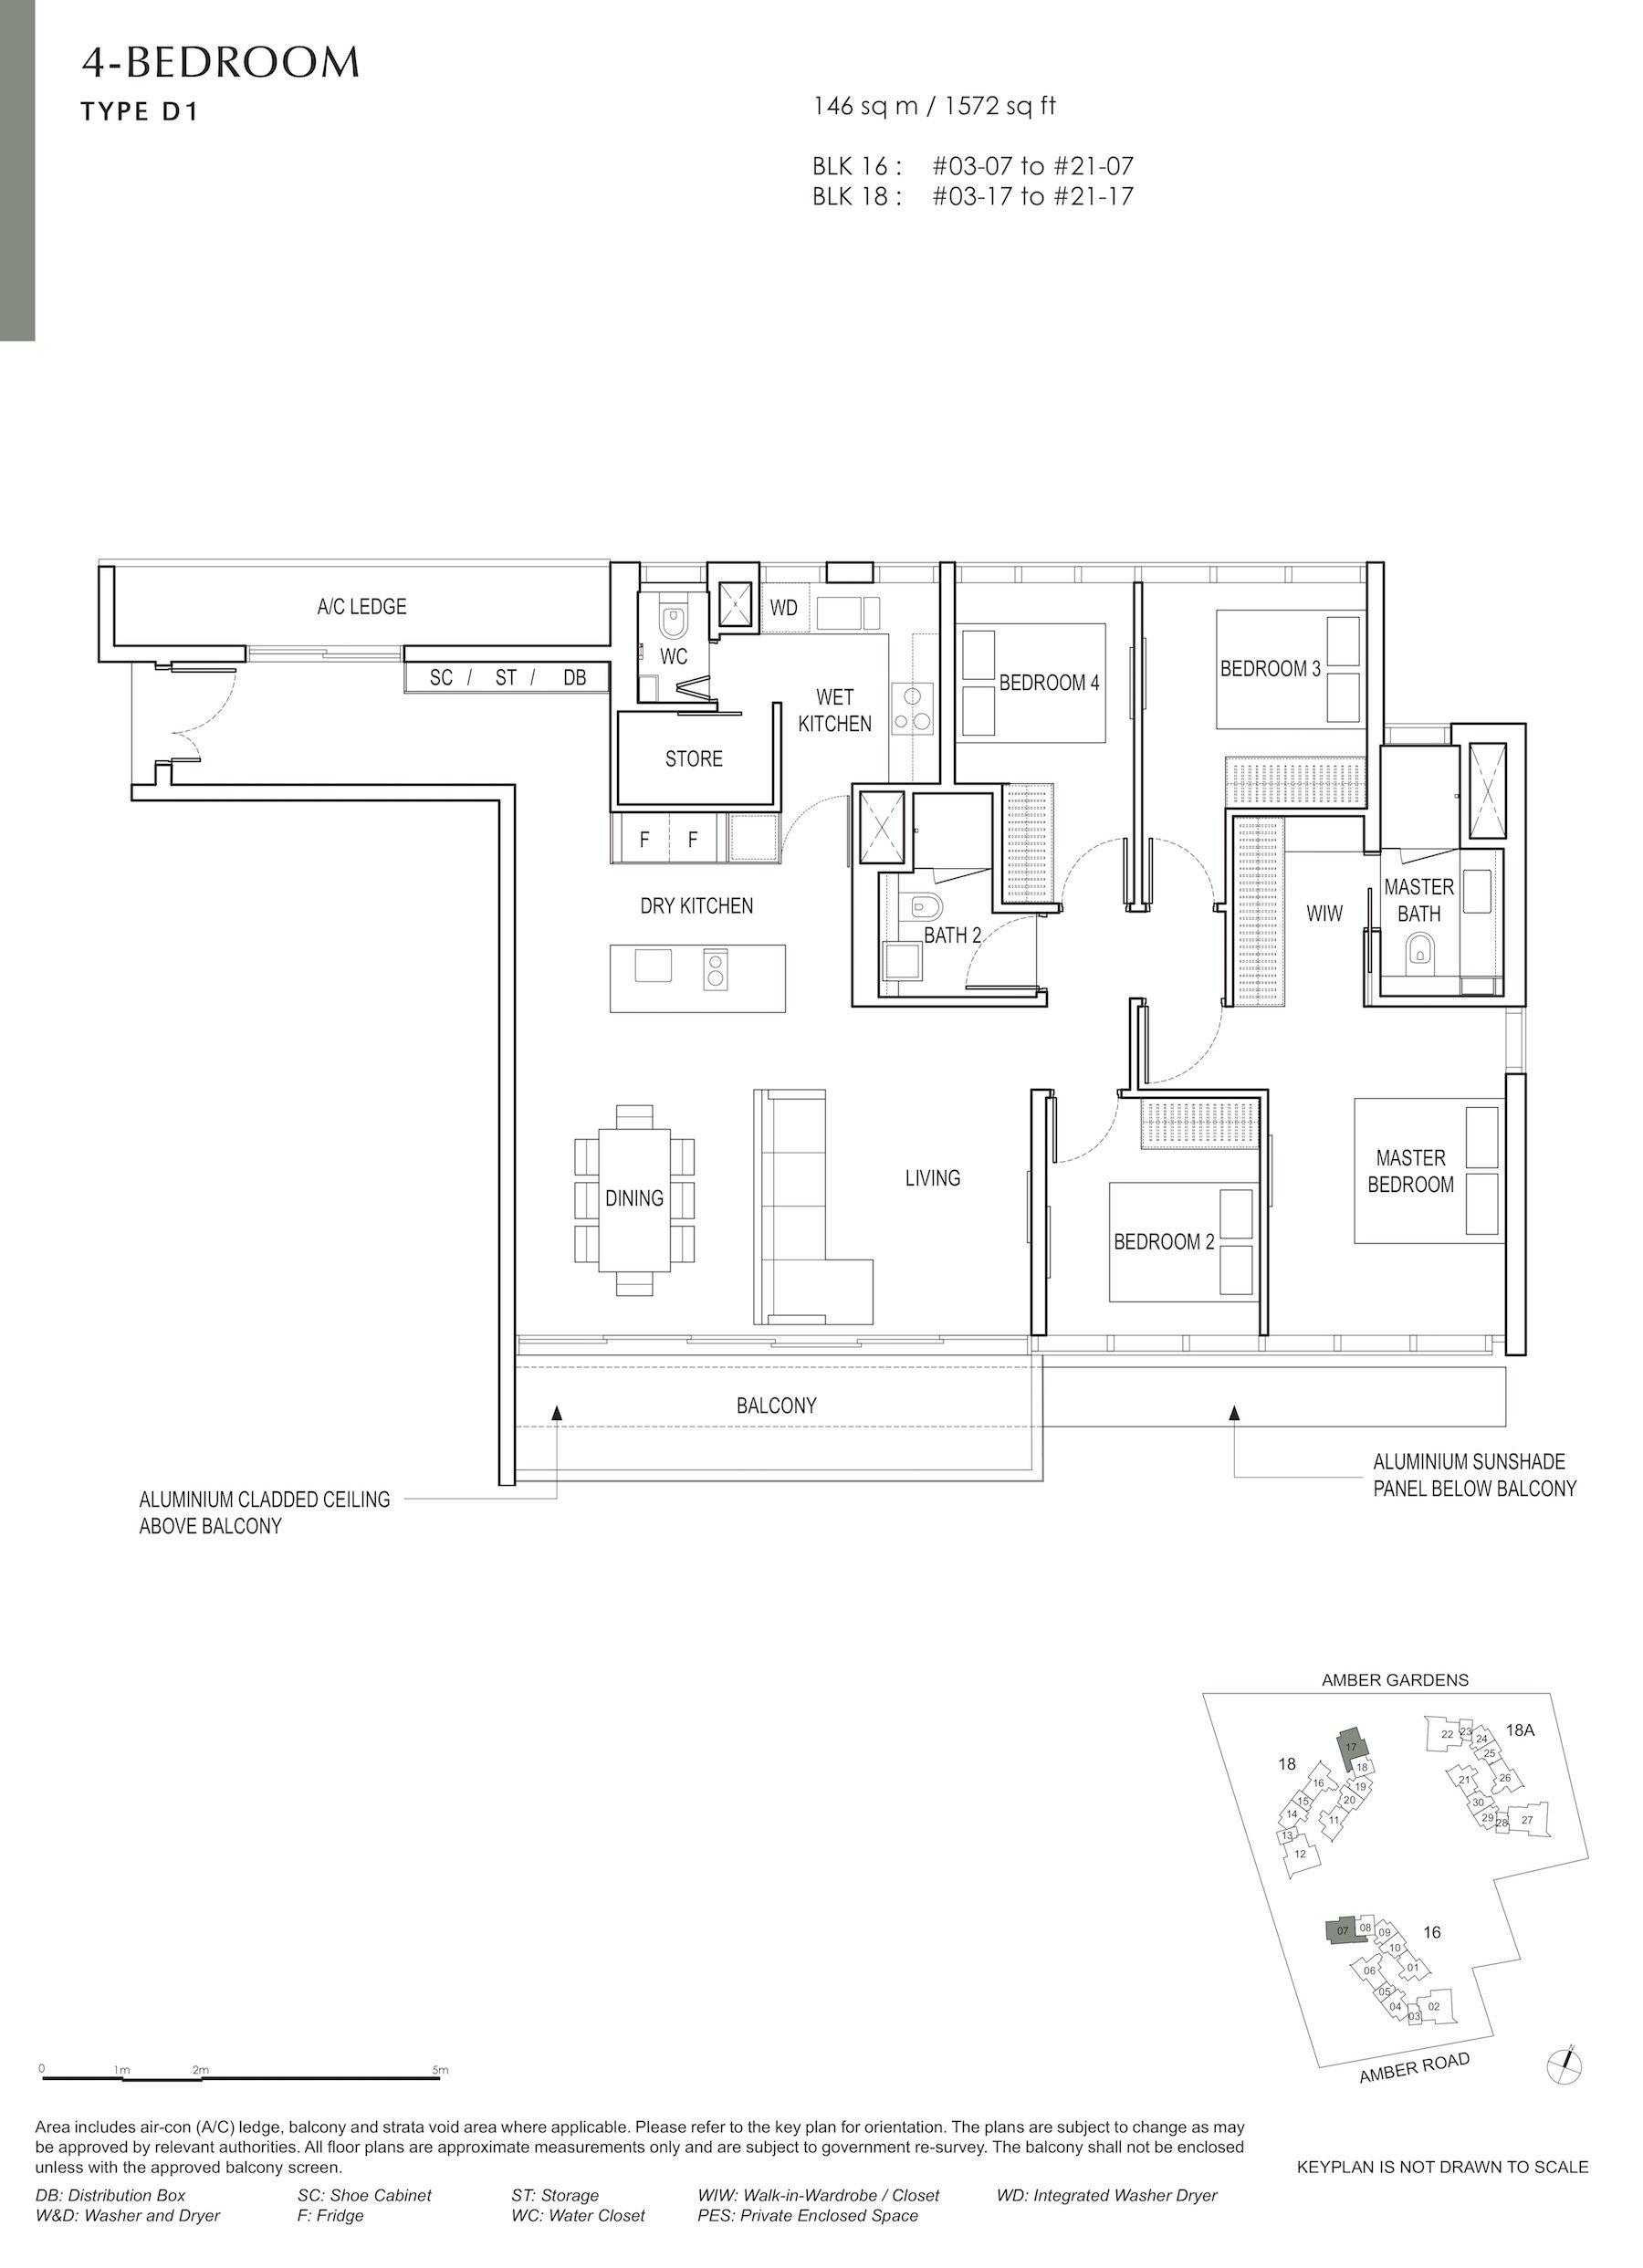 Amber Park 安铂苑 floor plan 4 bedroom 4卧房 D1